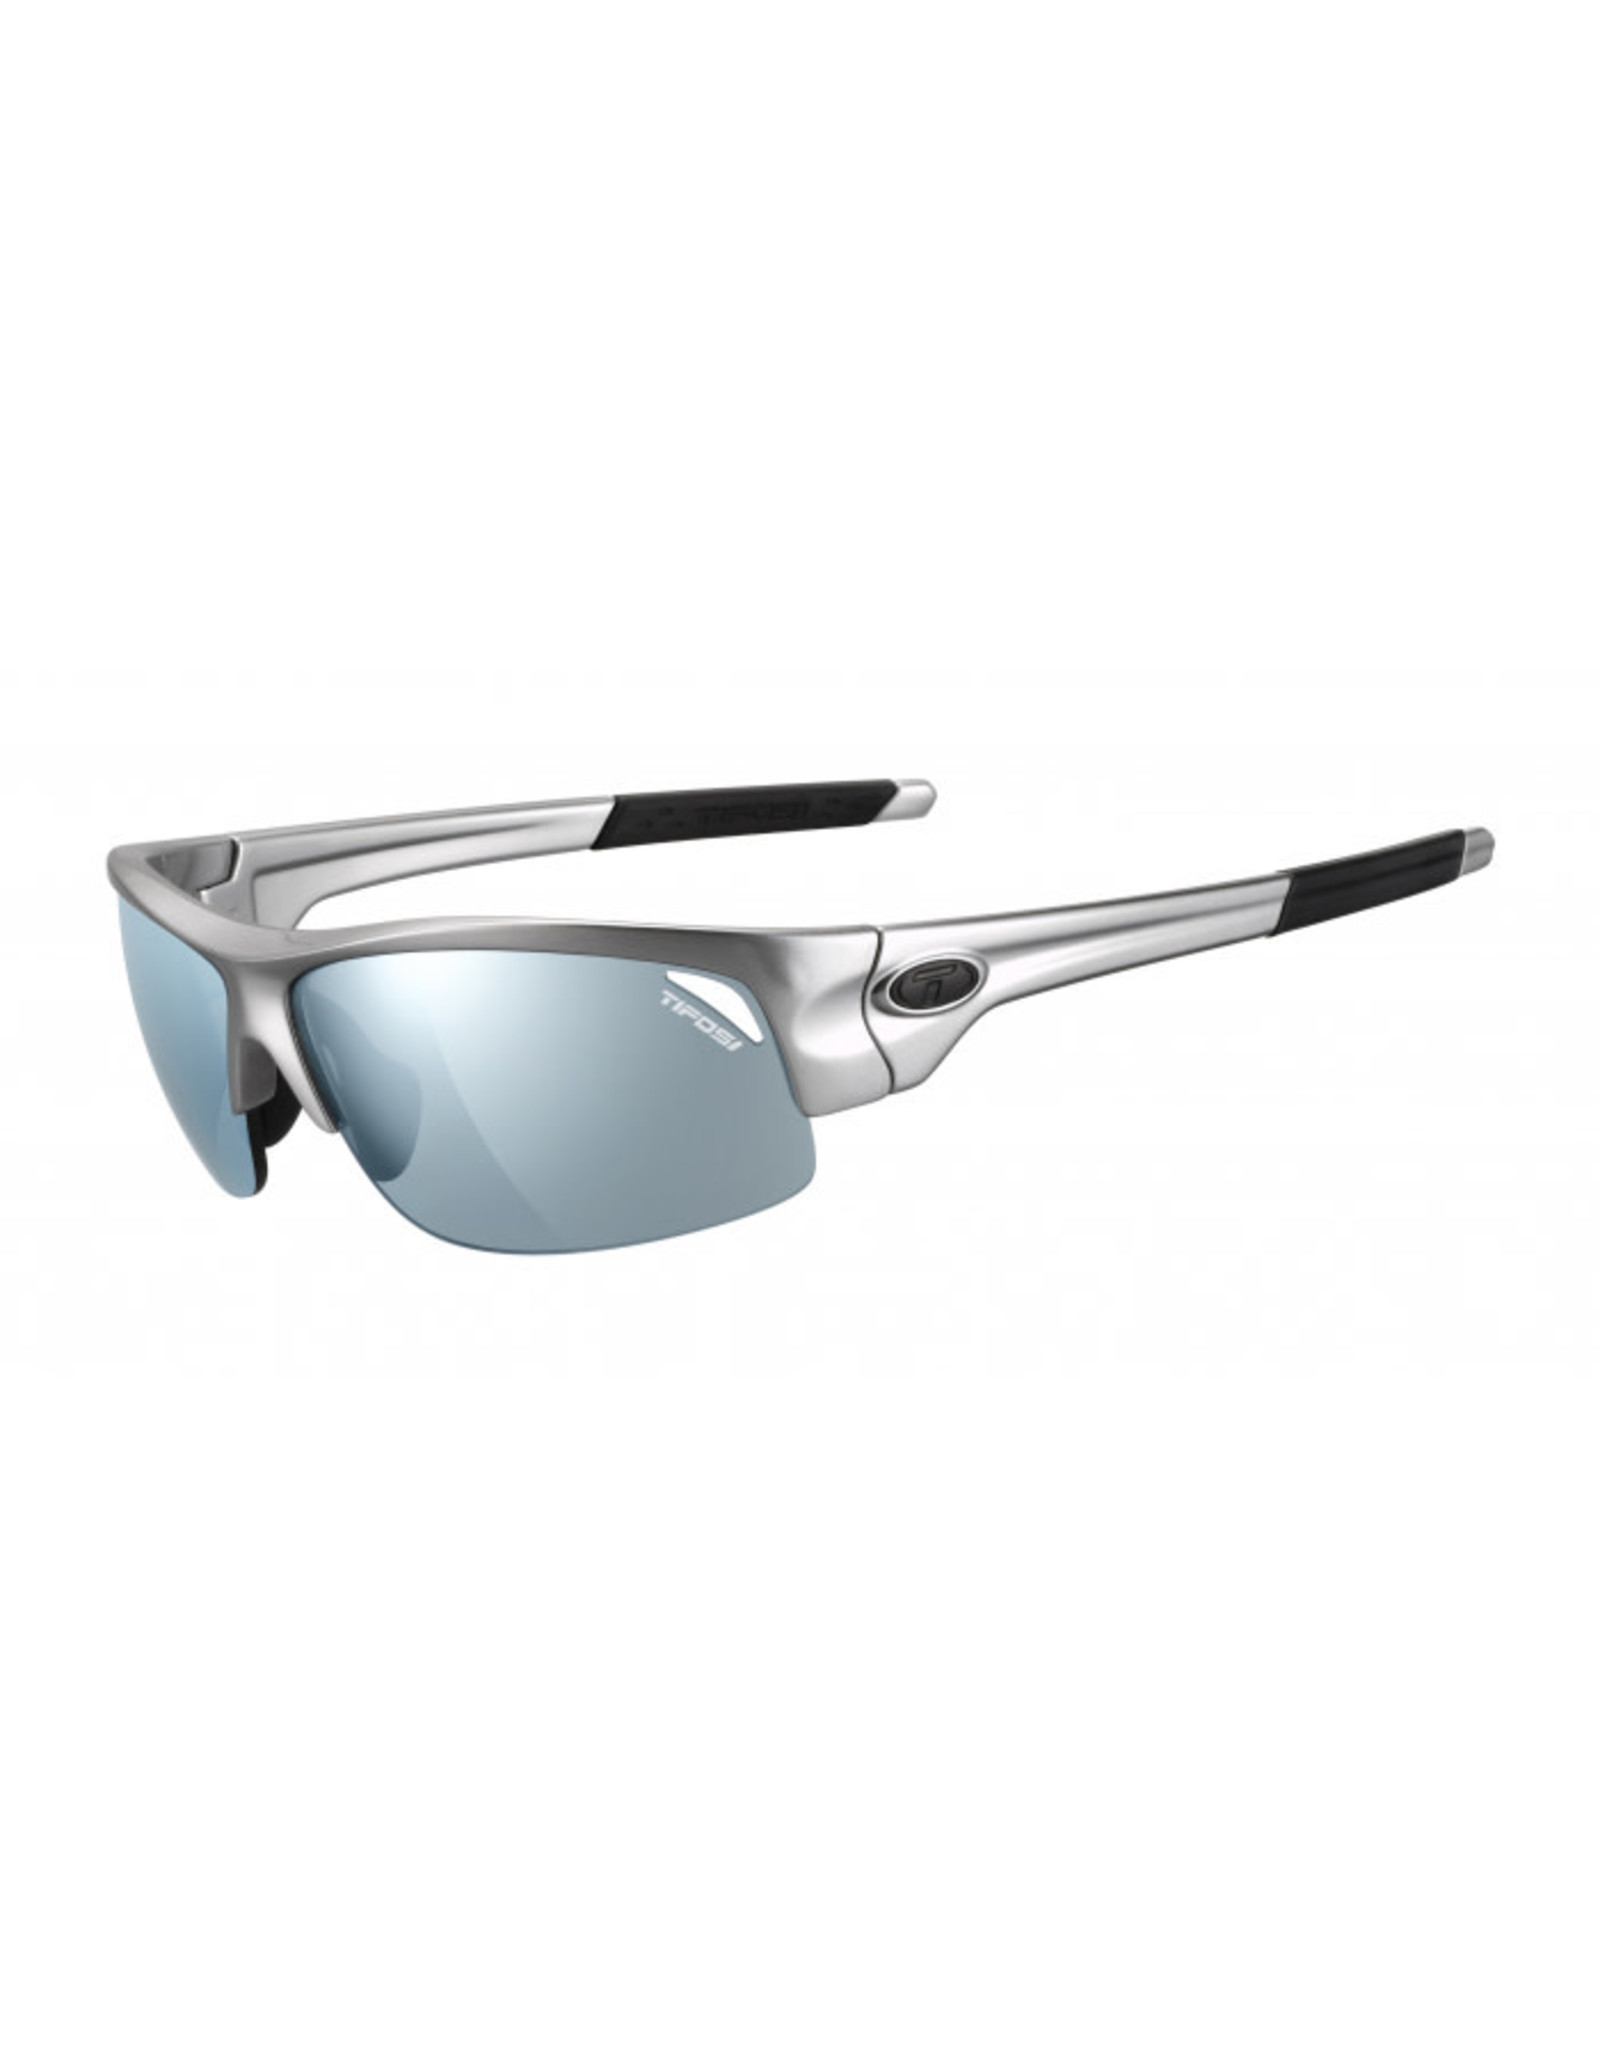 TIFOSI Saxon Cycling Sunglasses